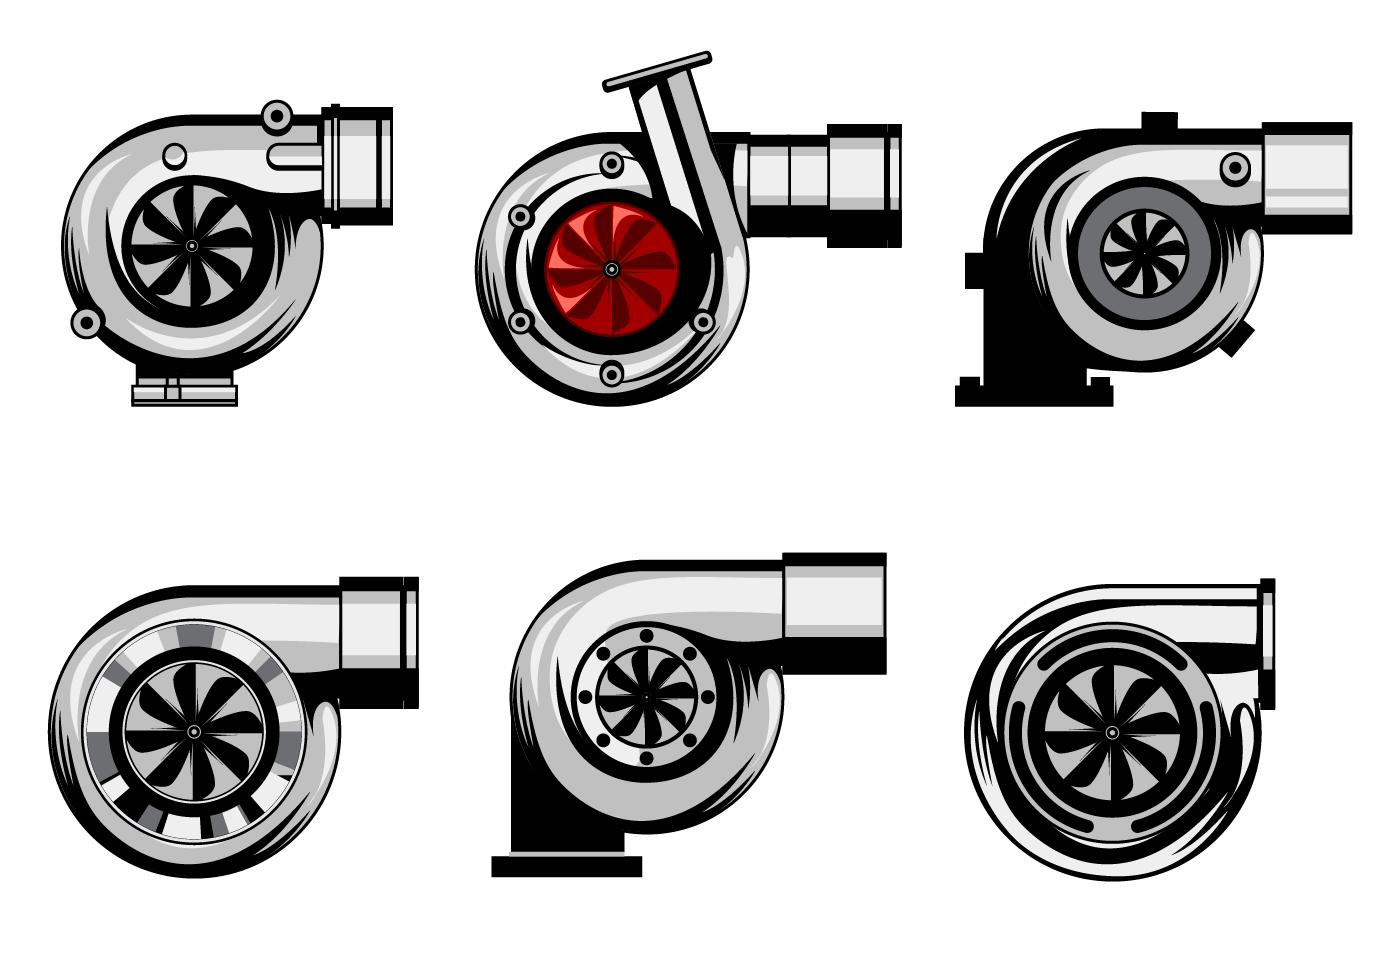 Free Turbocharger Vector Automotive art, Vector art, Rat